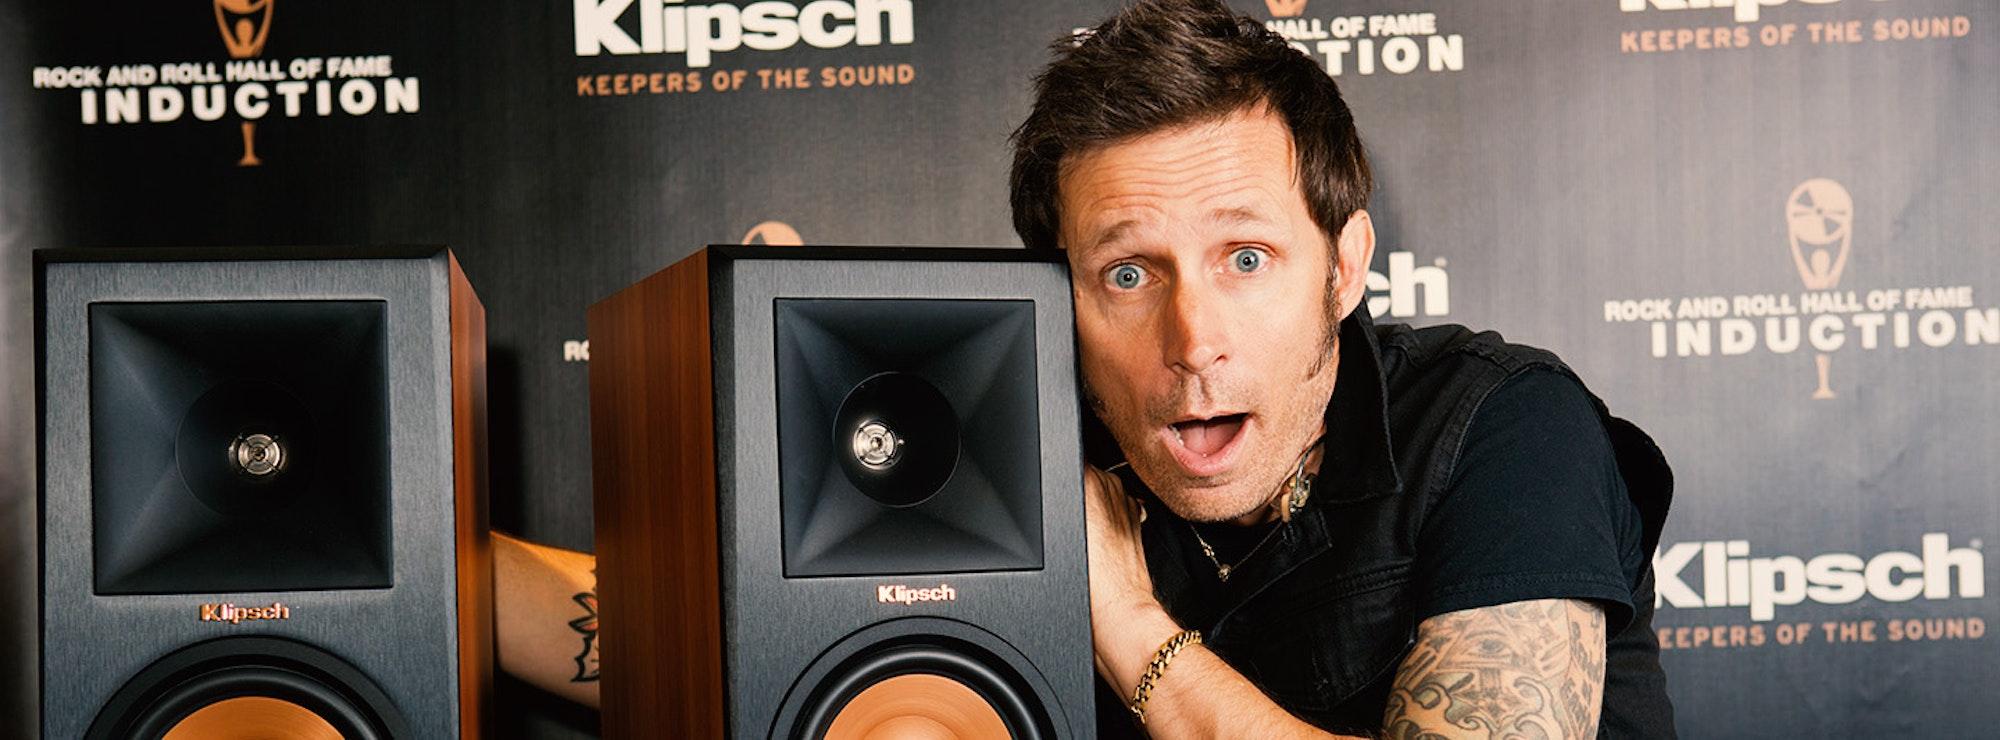 Mike Dirnt with Klipsch speakers